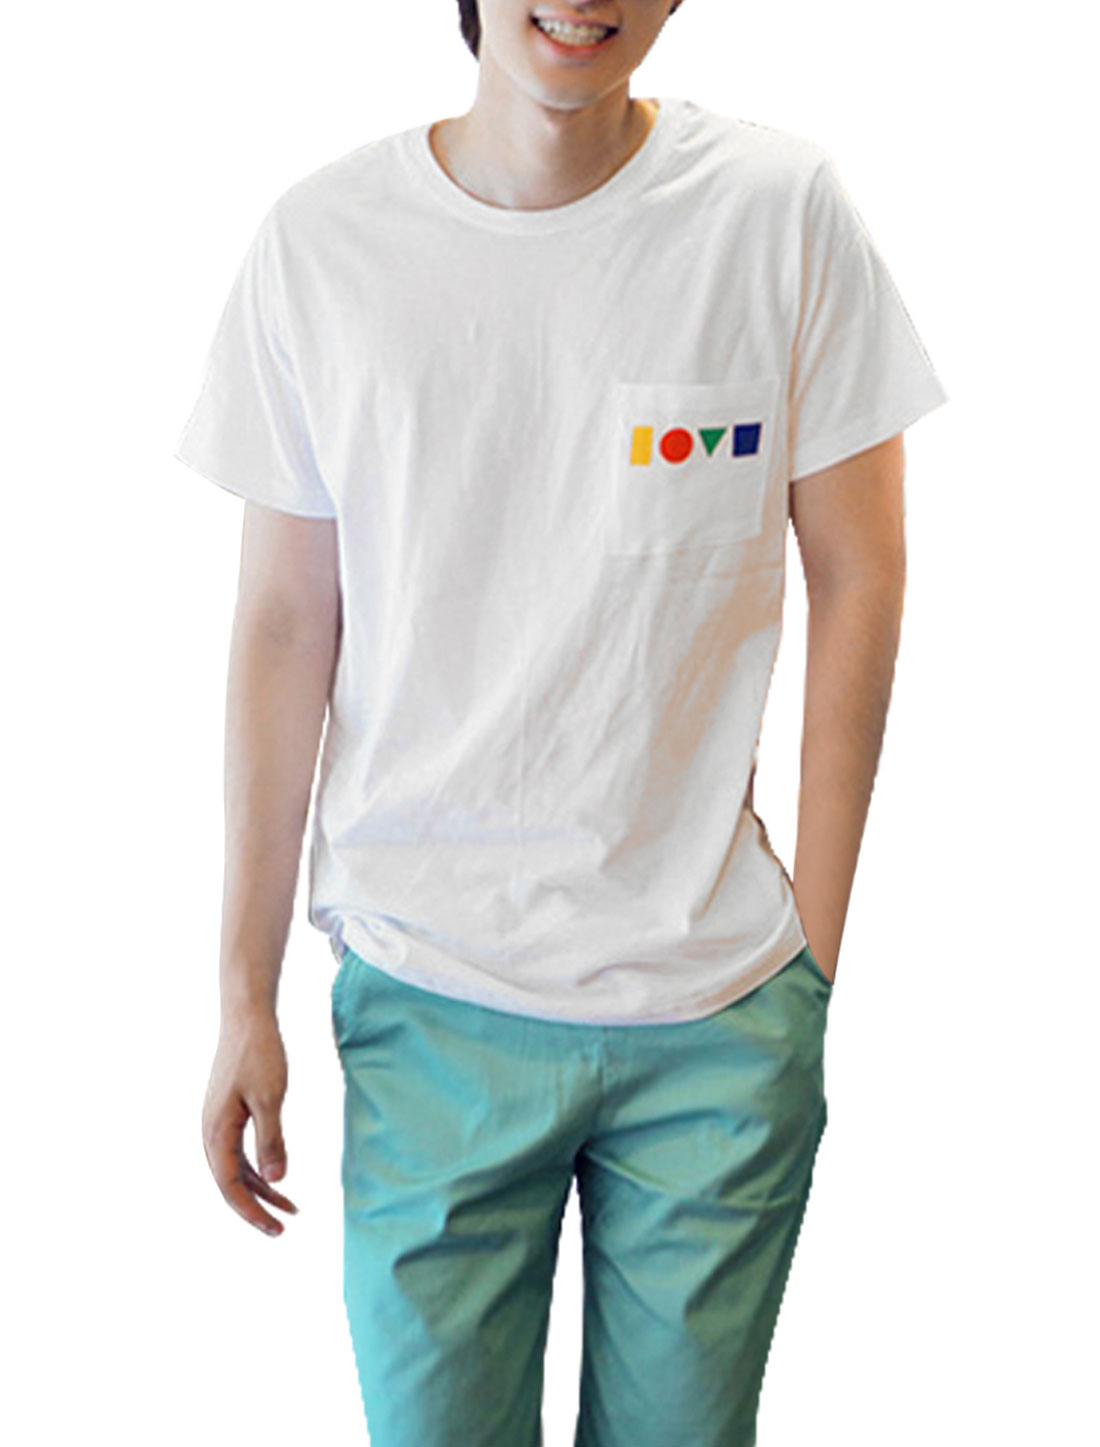 Man Round Neck Short Sleeve Chest Pocket Fashion Shirt White S